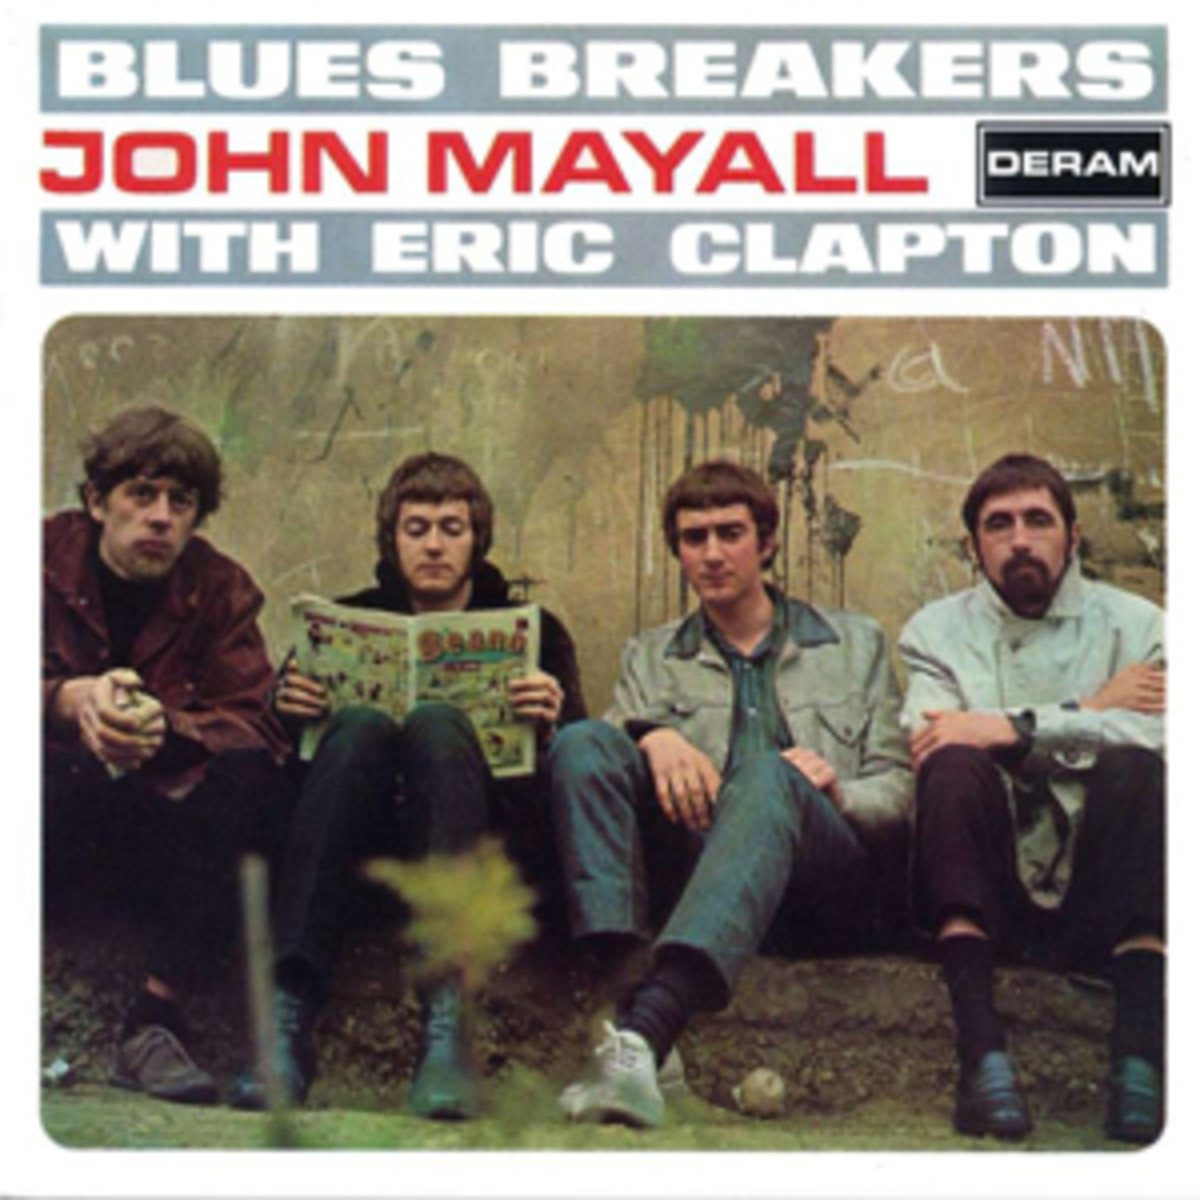 MayallClapton_Bluesbreakers